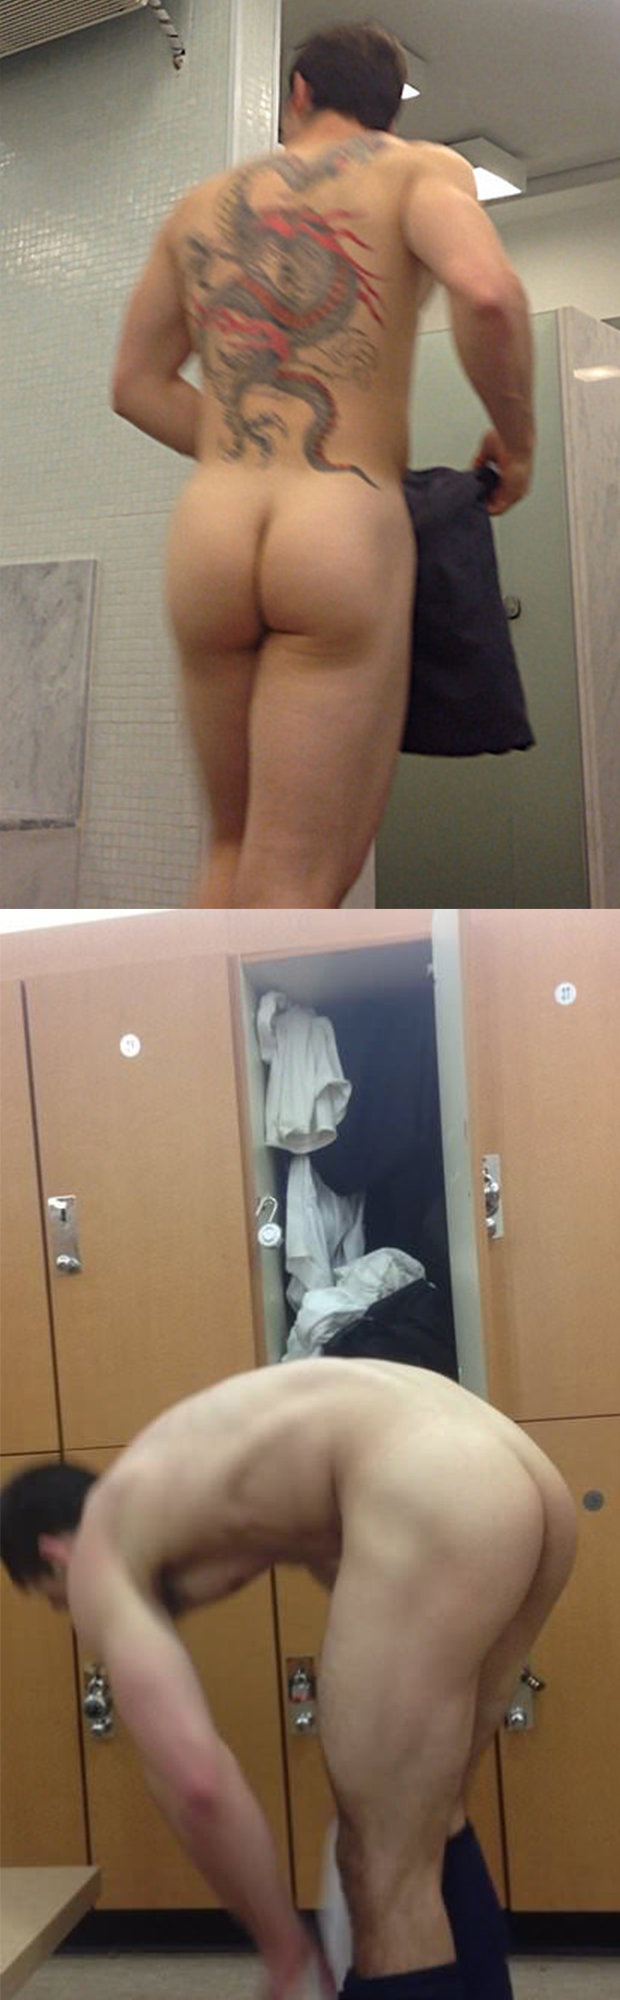 ass lockerroom